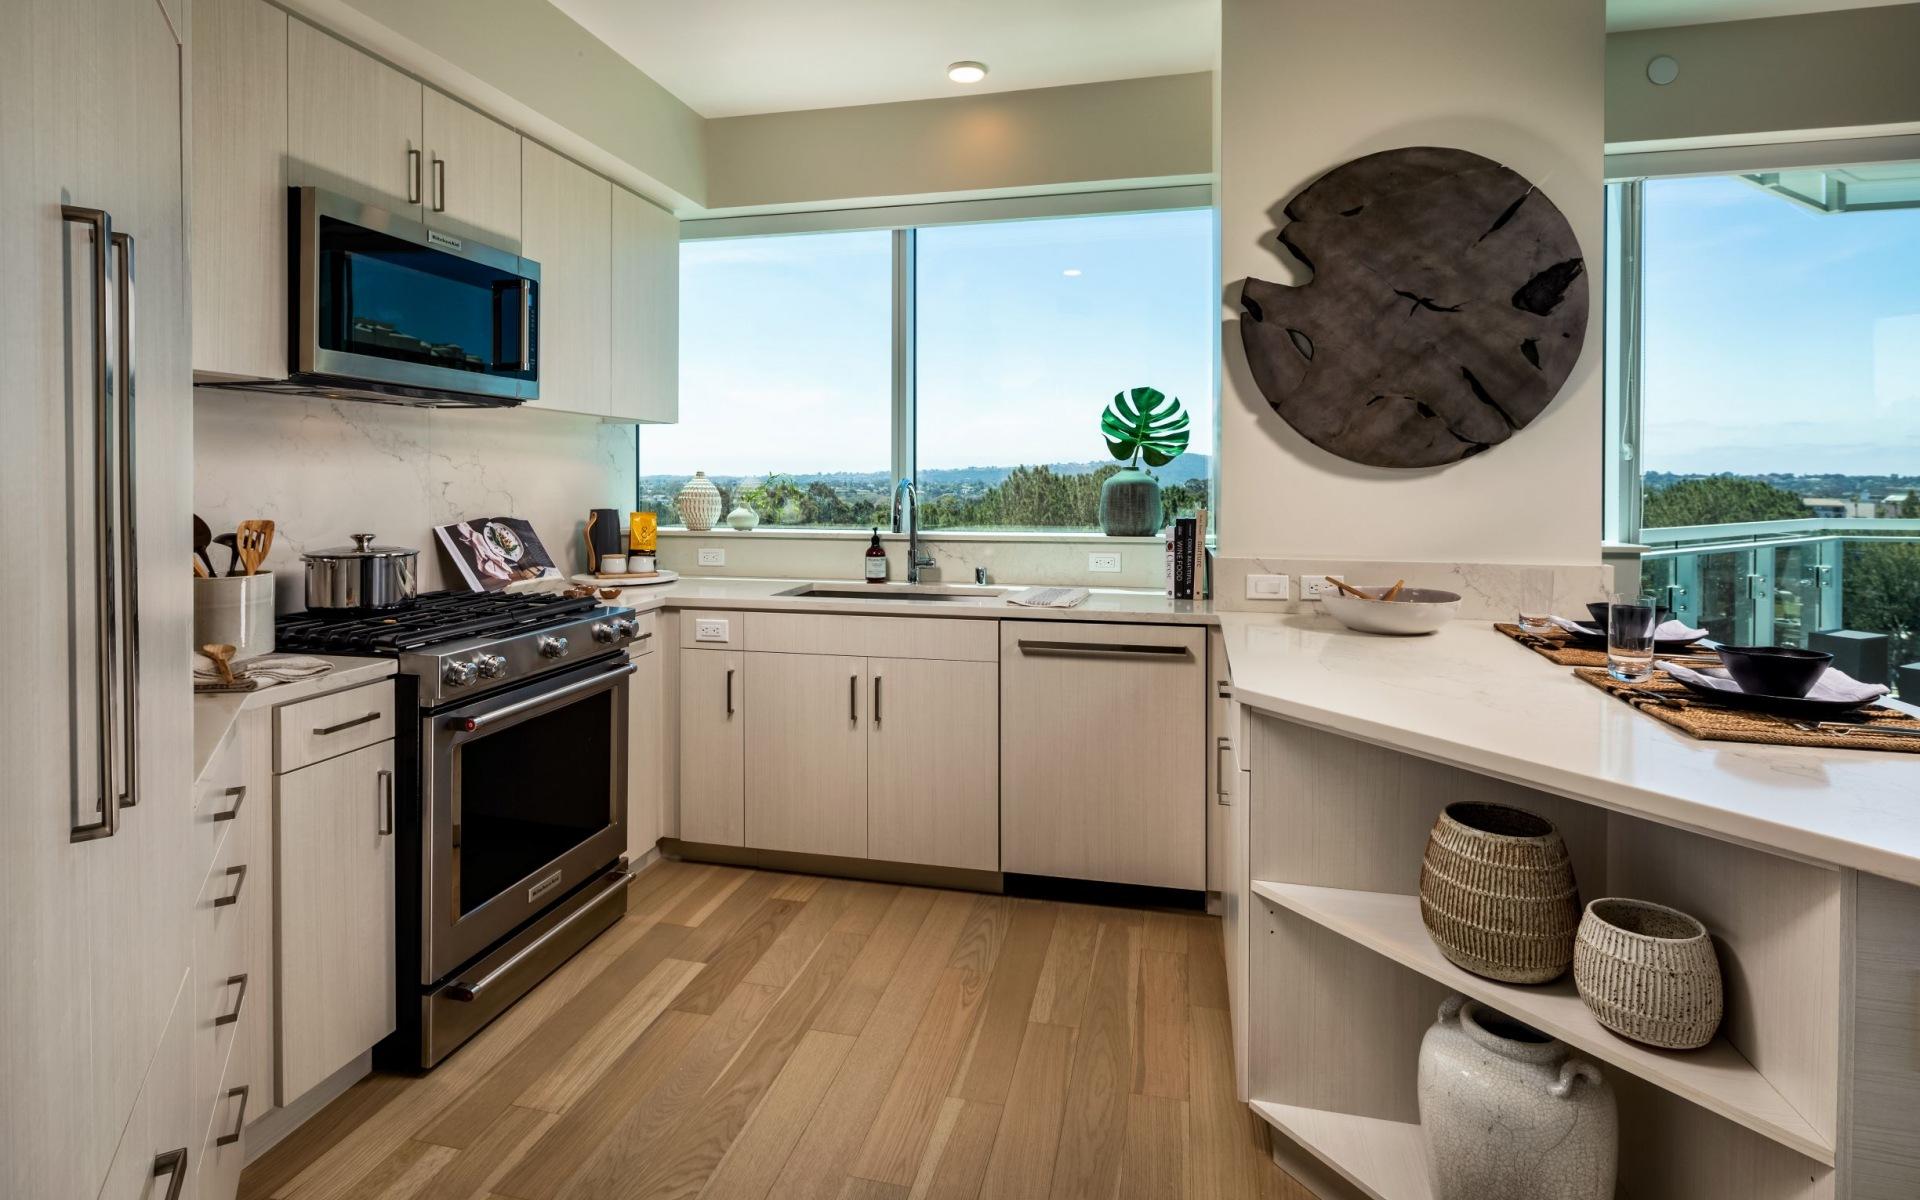 Palisade penthouse kitchen